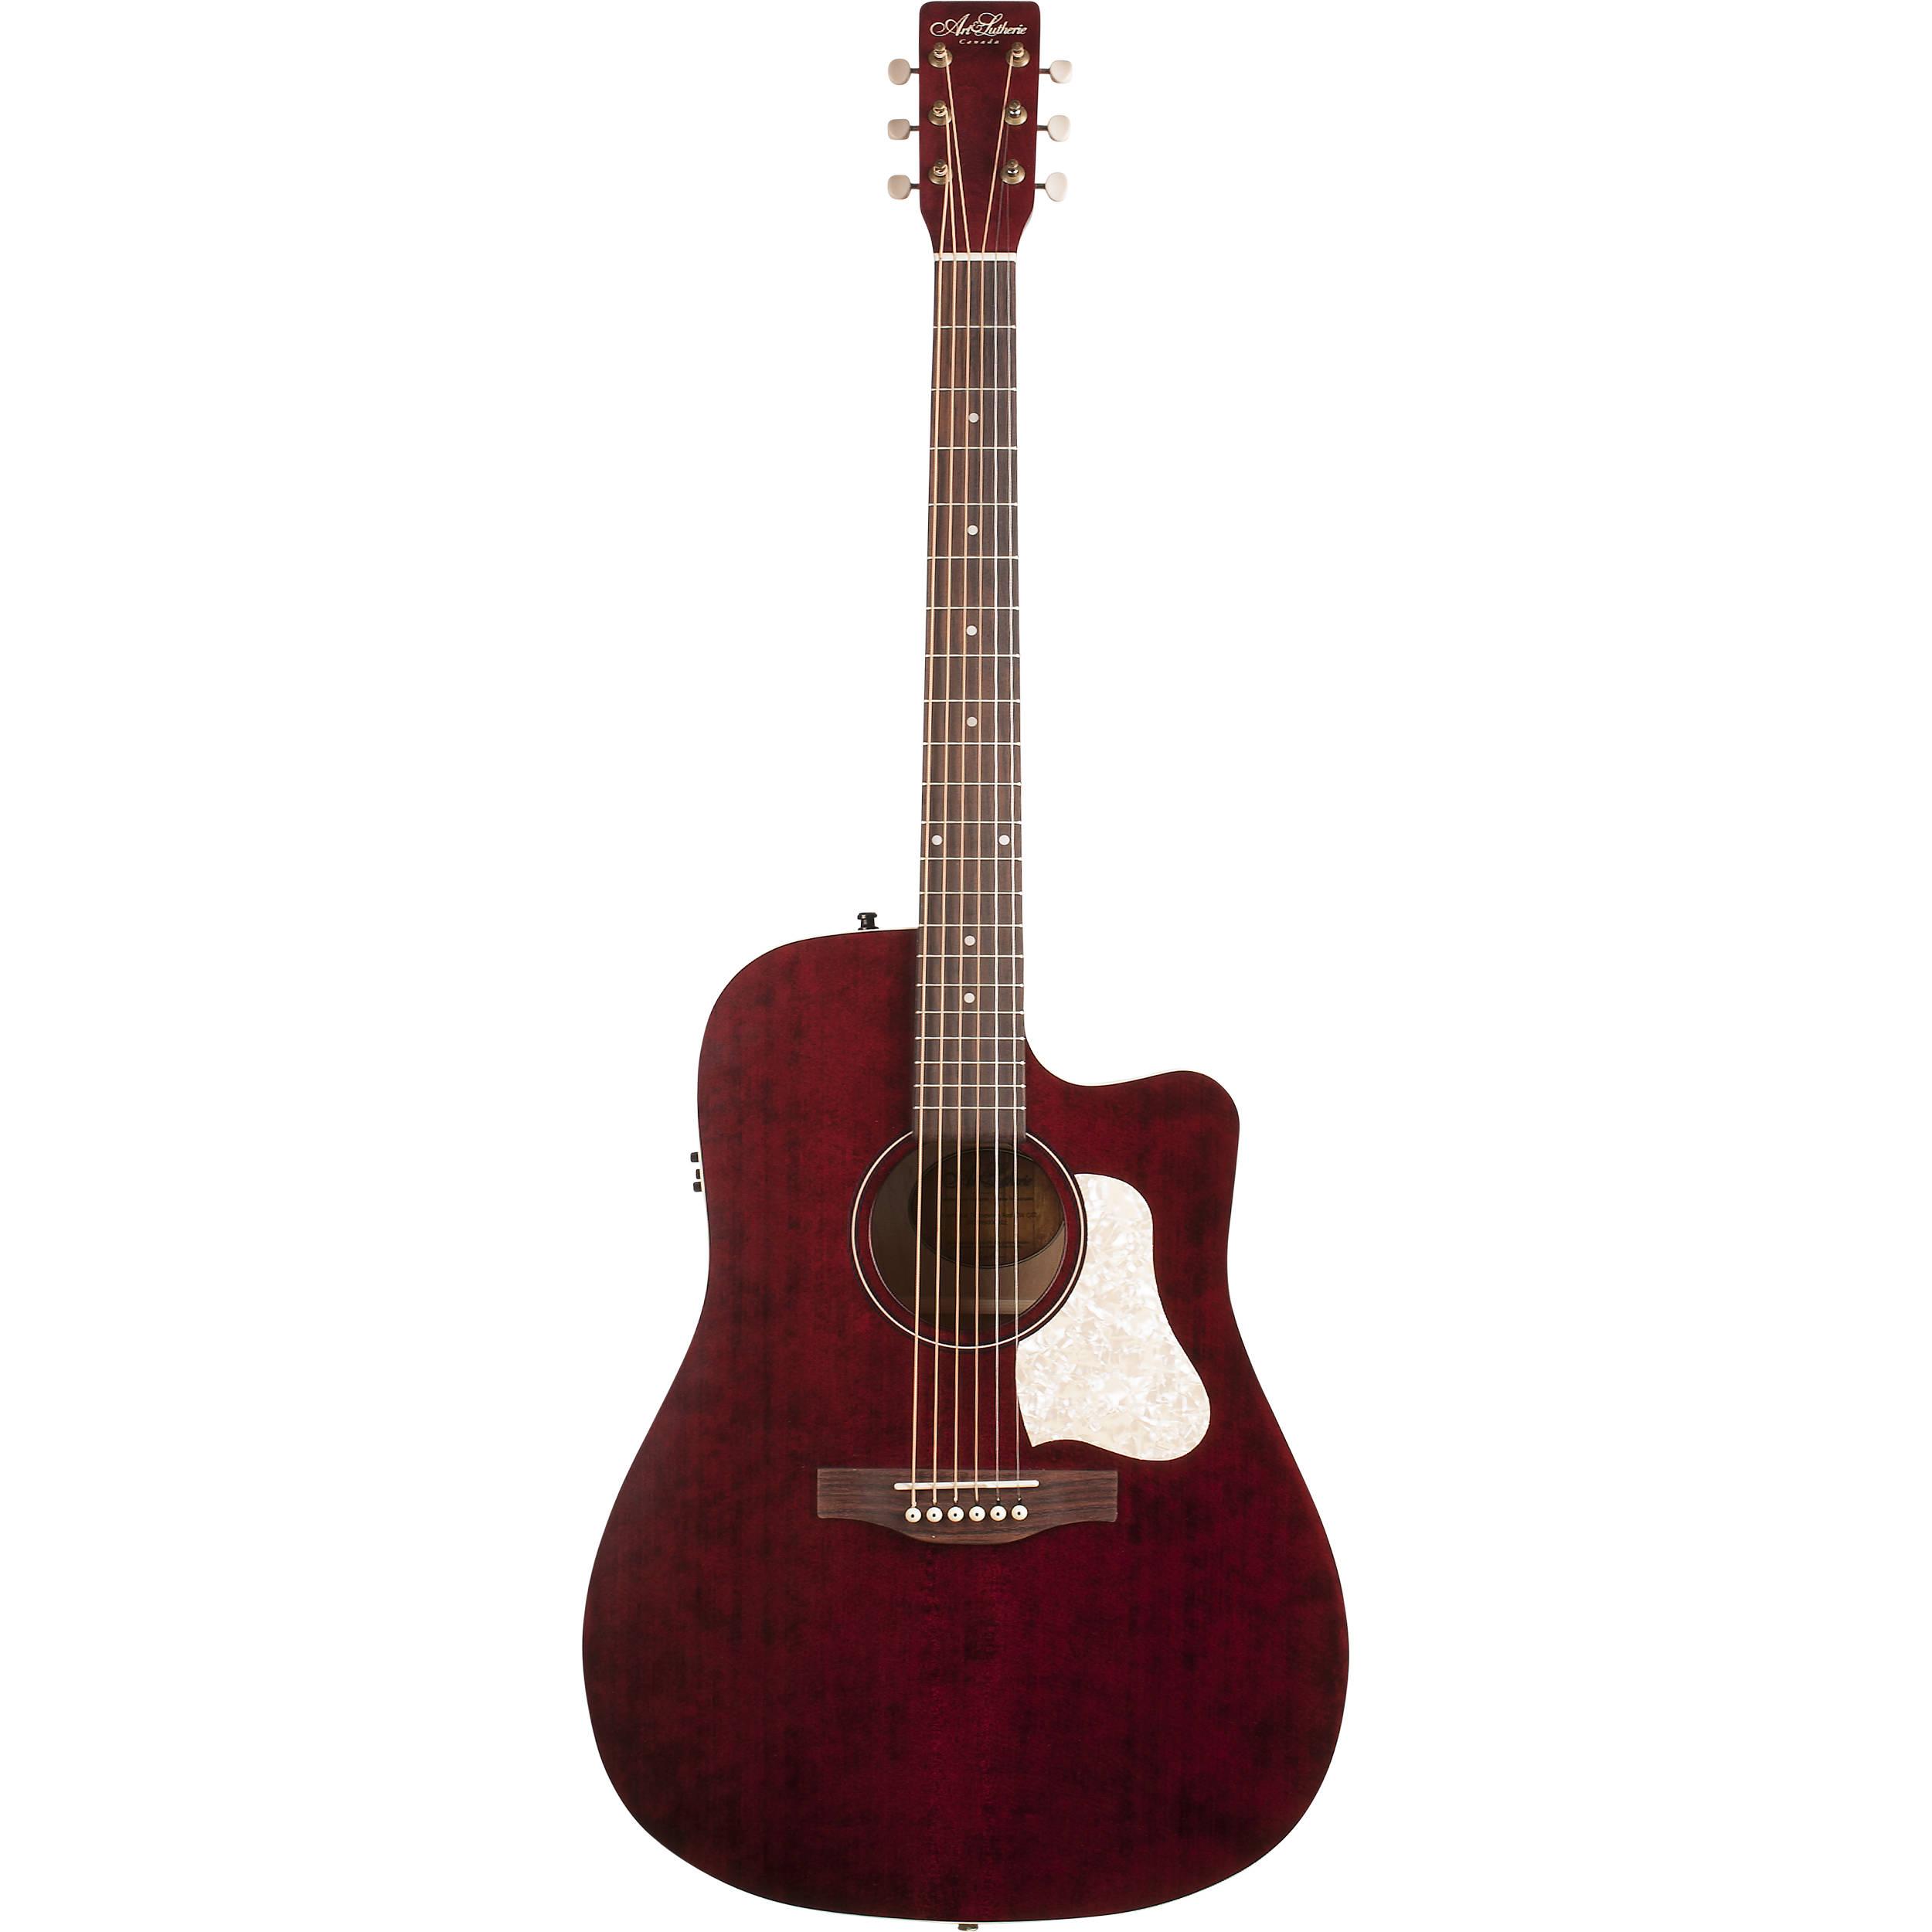 seagull guitars a l americana tennessee red cw qit 042449 3 String Bass seagull guitars a l americana tennessee red cw qit guitar